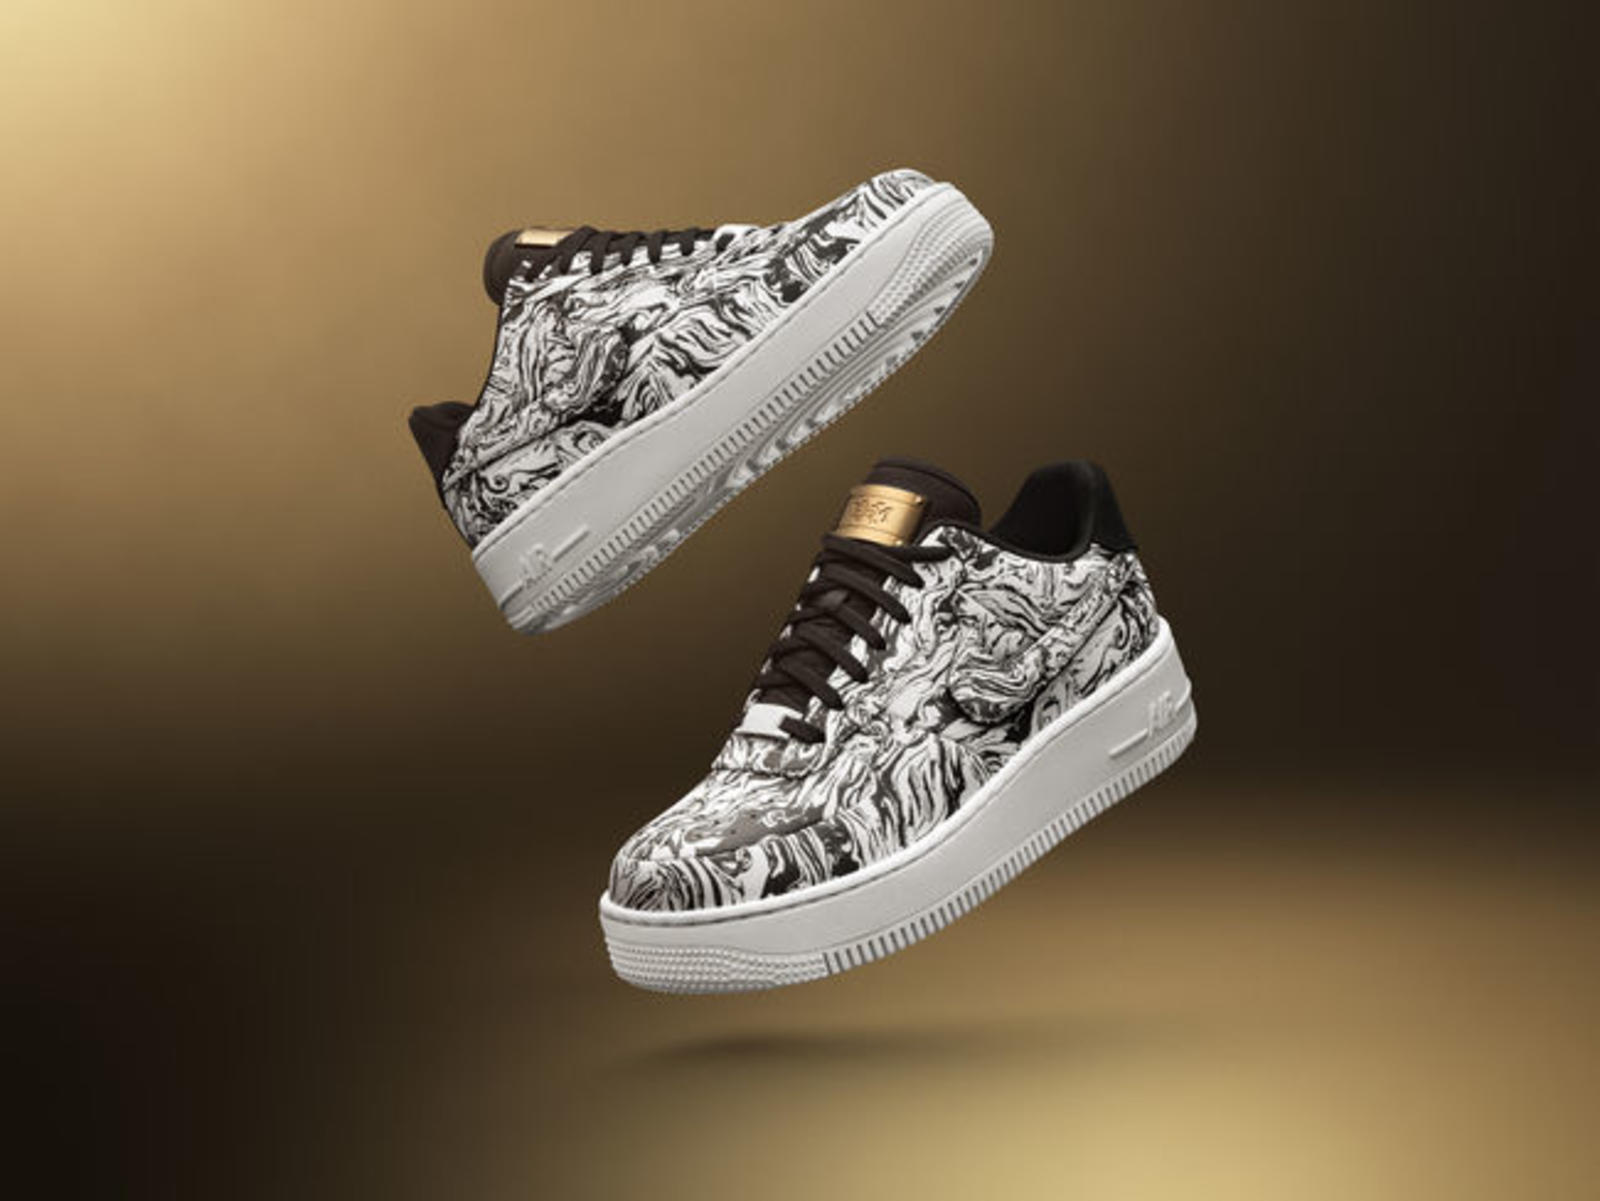 Nike WMNS Air Force 1 Upstep BHM